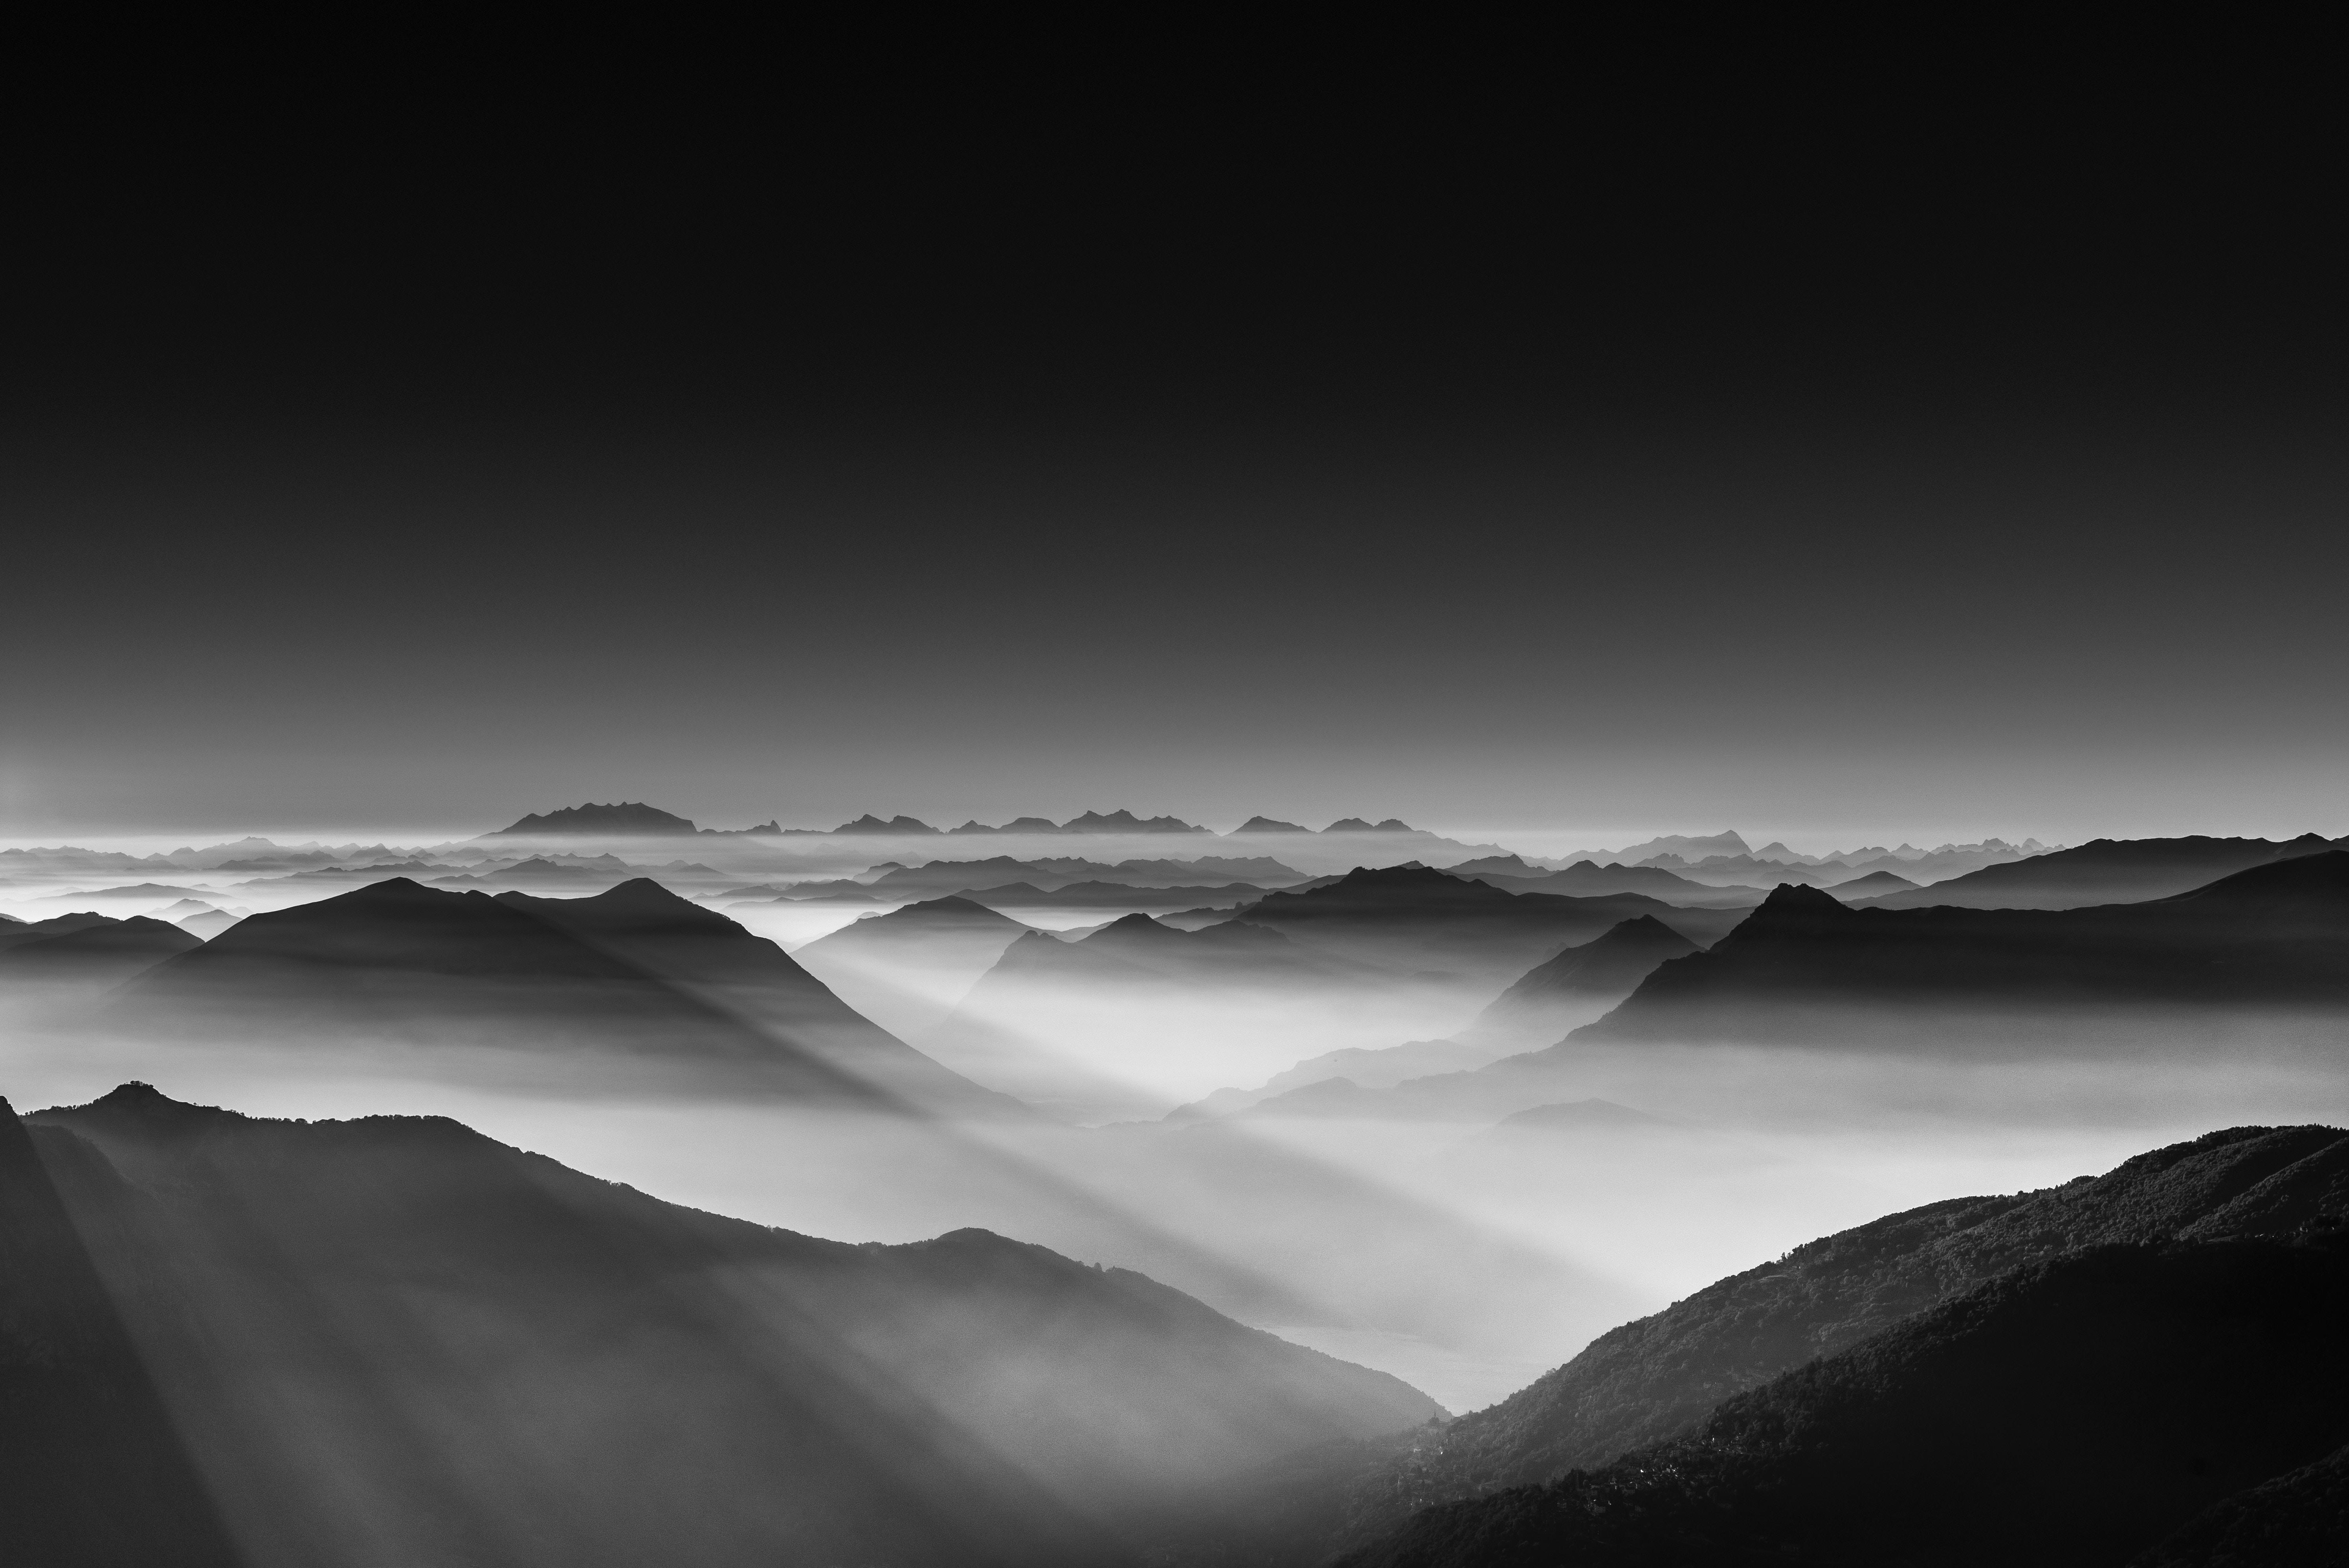 1920x1080 Haze Mountain Landscape Monochrome 5k Laptop Full Hd